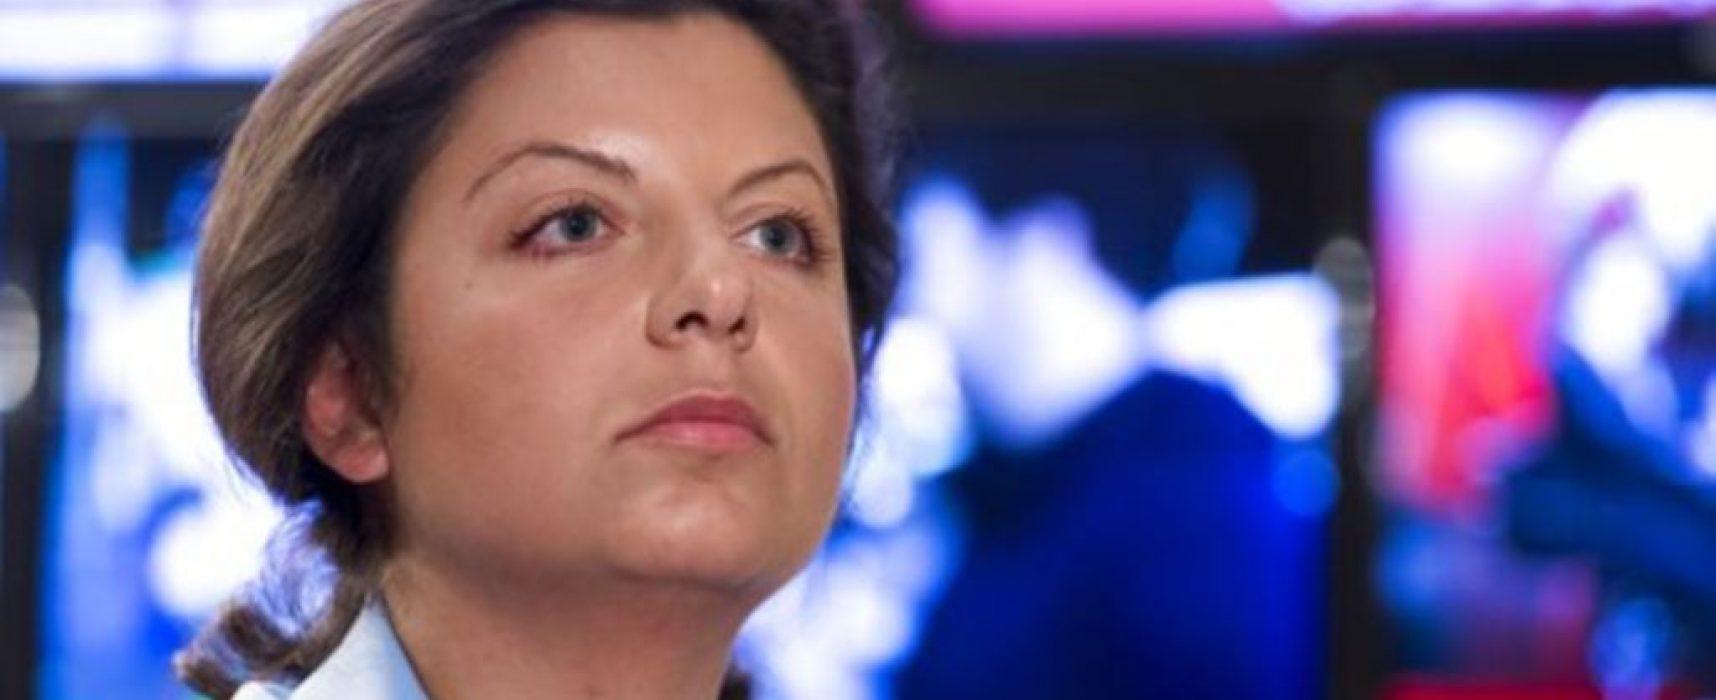 Британский регулятор обвинил телеканал RT в нарушении правил вещания